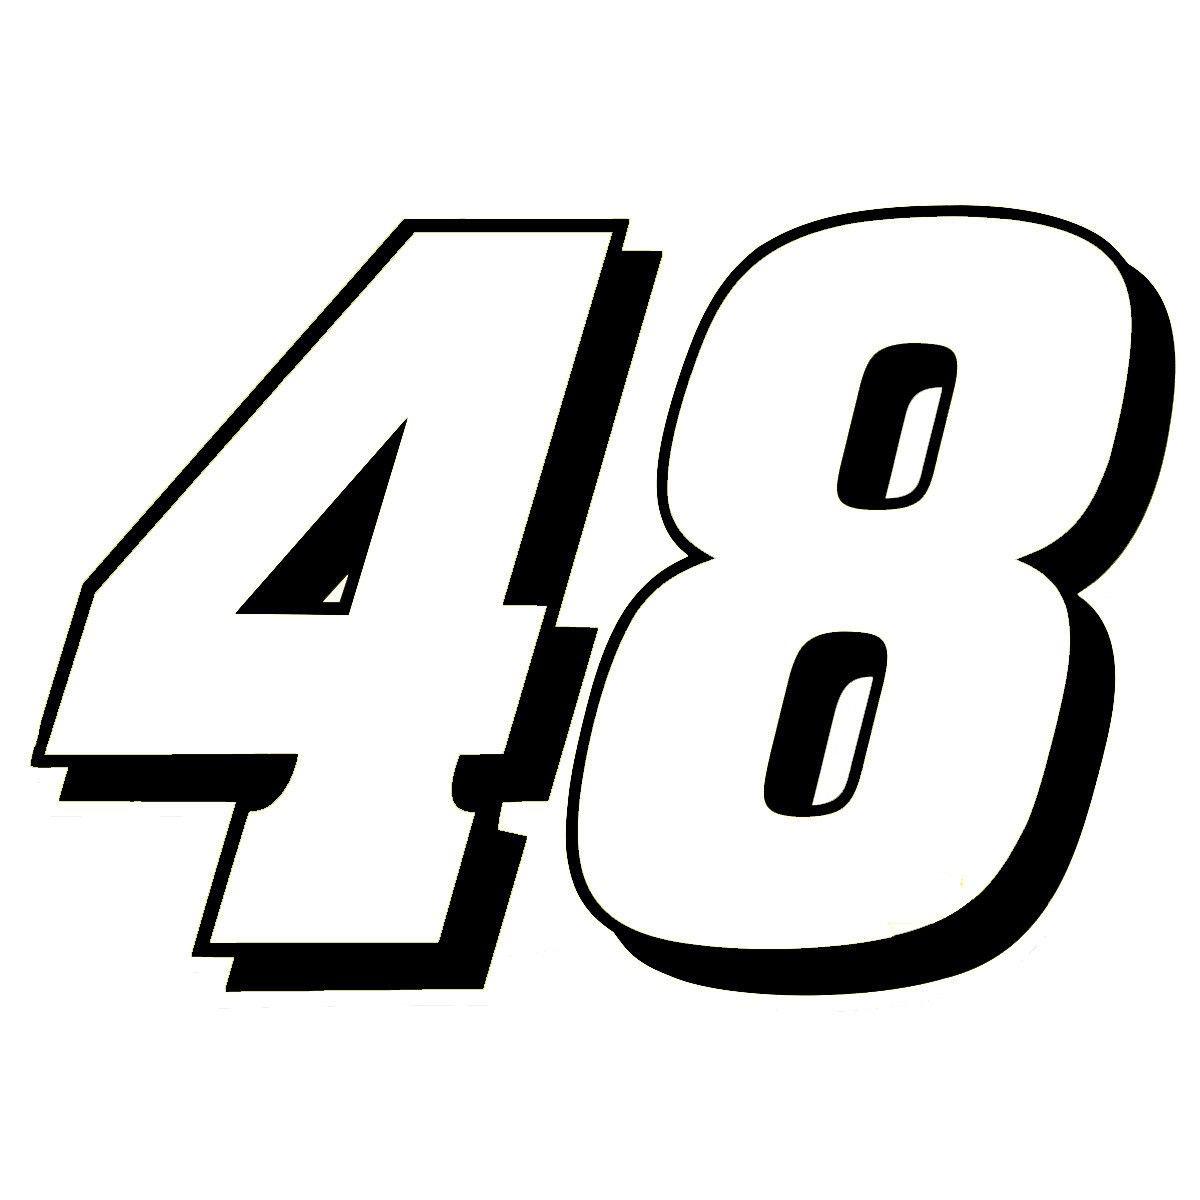 "4"" Jimmie Johnson 48 Nacsar Vinyl Window Decal Sticker"